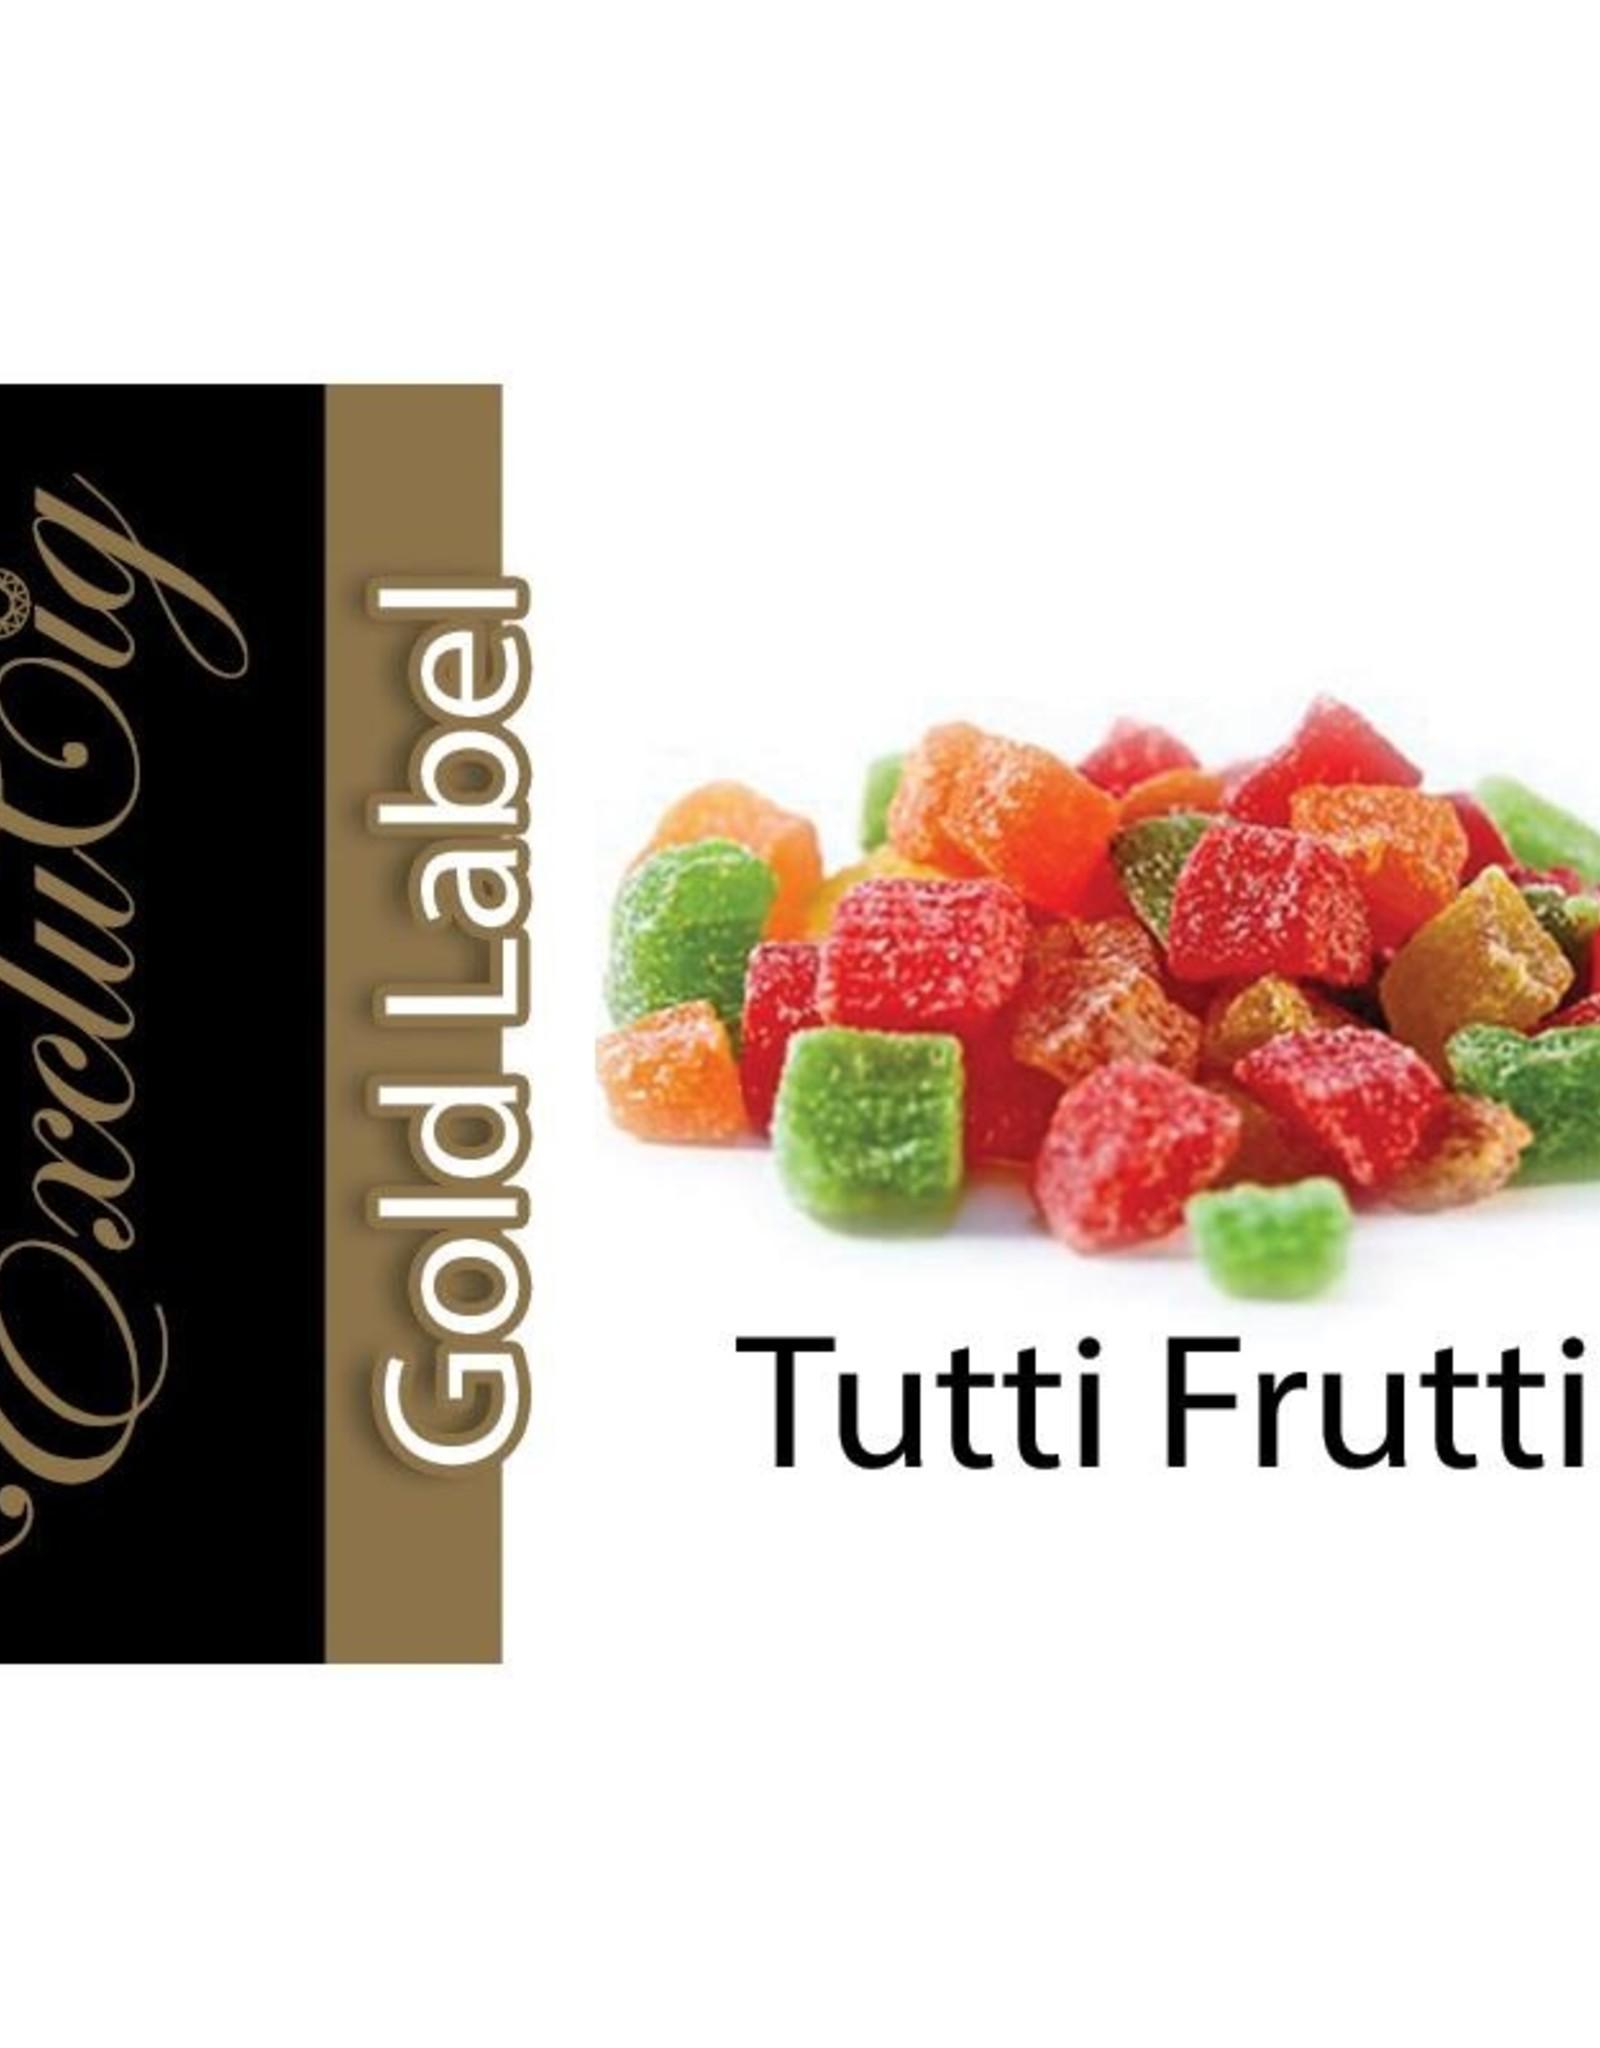 Exclucig Exclucig Gold Label E-liquid Tutti Frutti 18 mg Nicotine